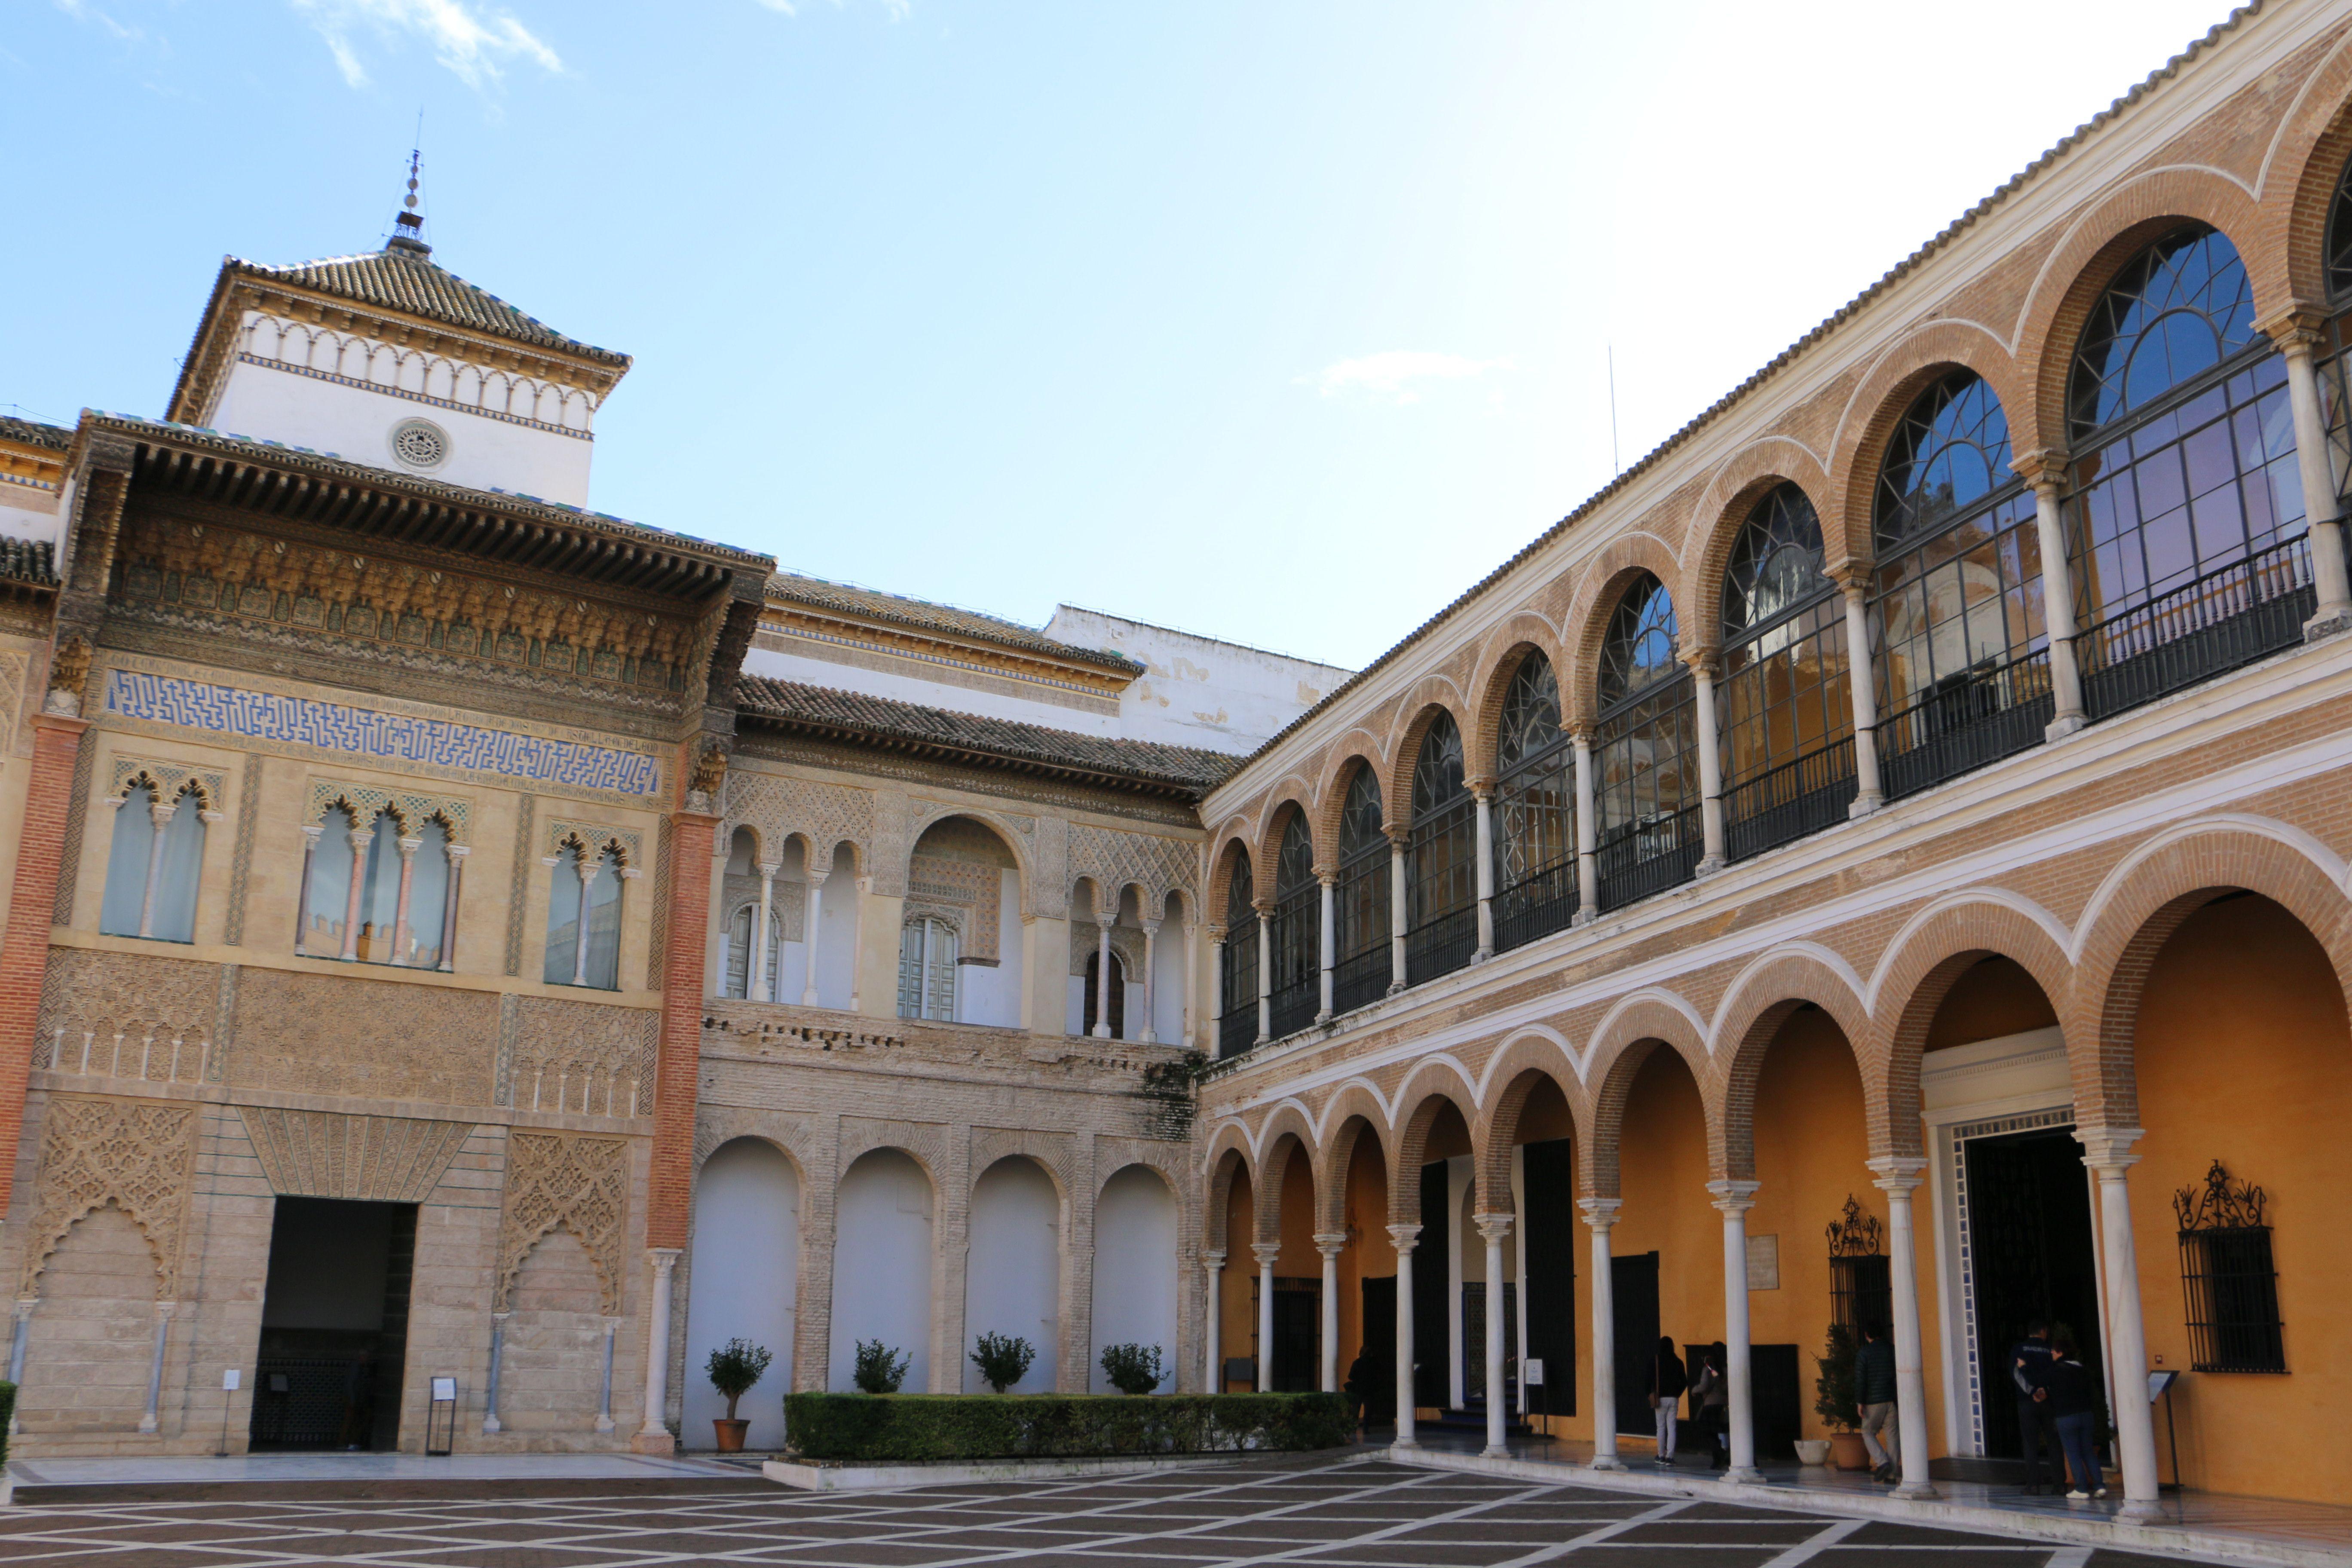 Reales Alcázares in Seville, Spain Sevilla, Casas, Casas